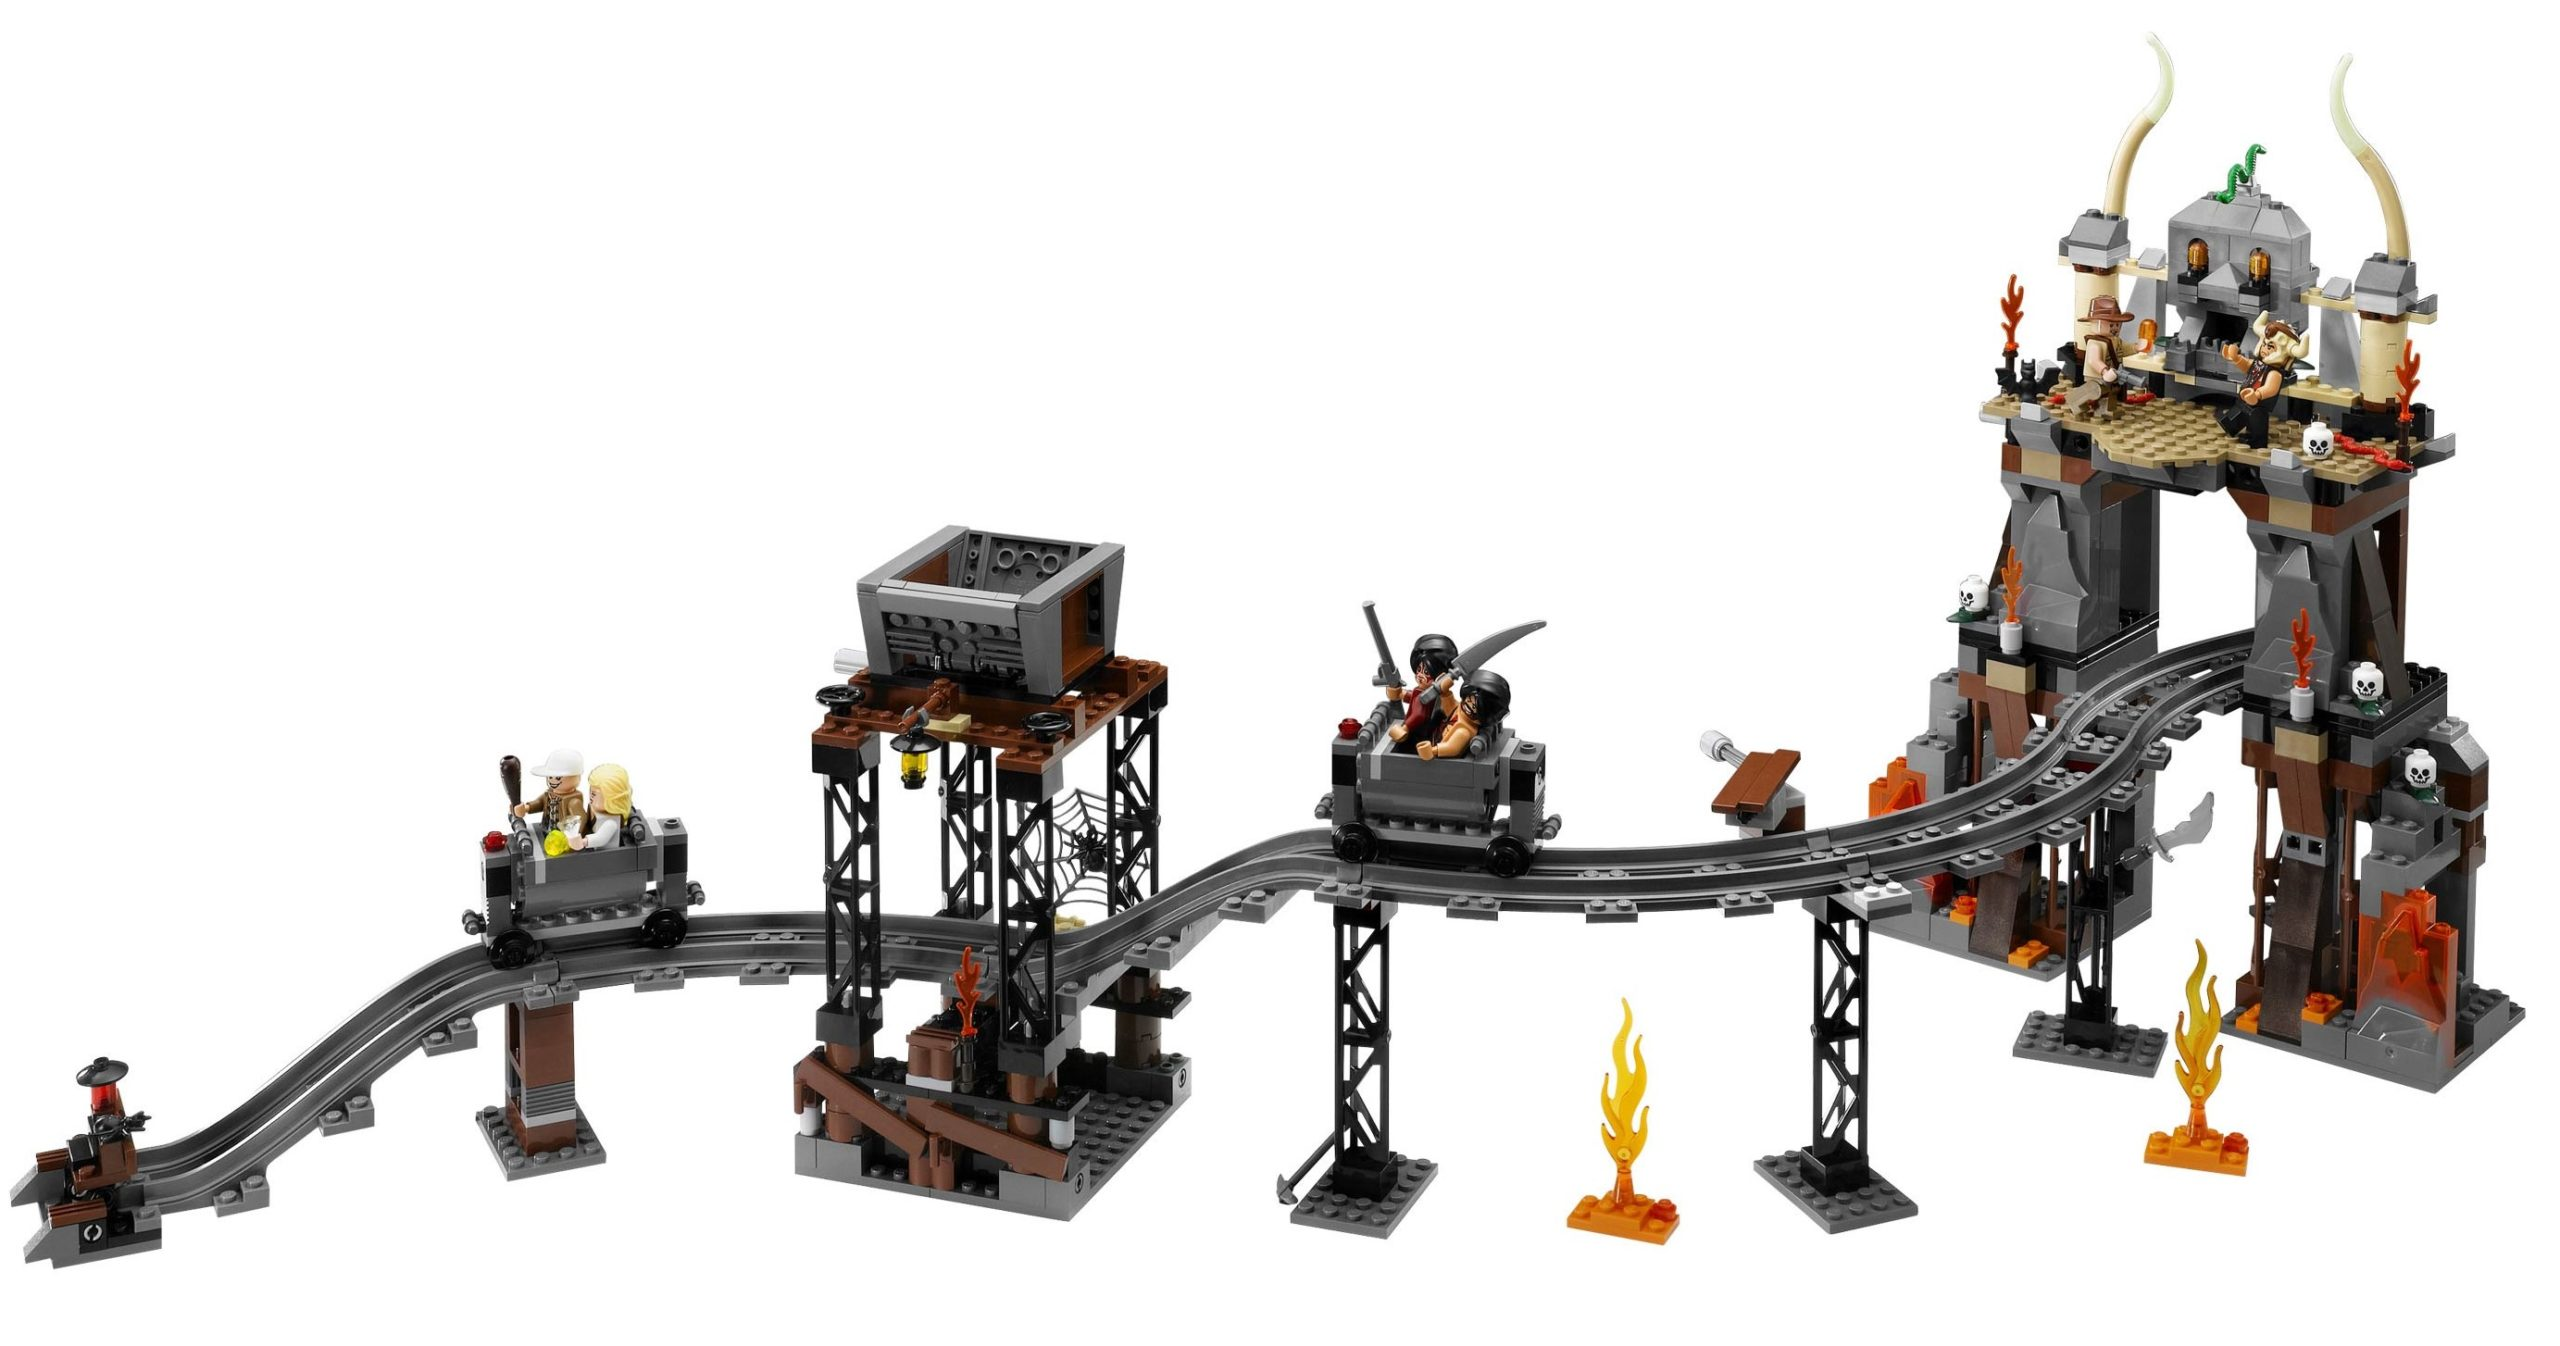 lego indiana jones temple of doom